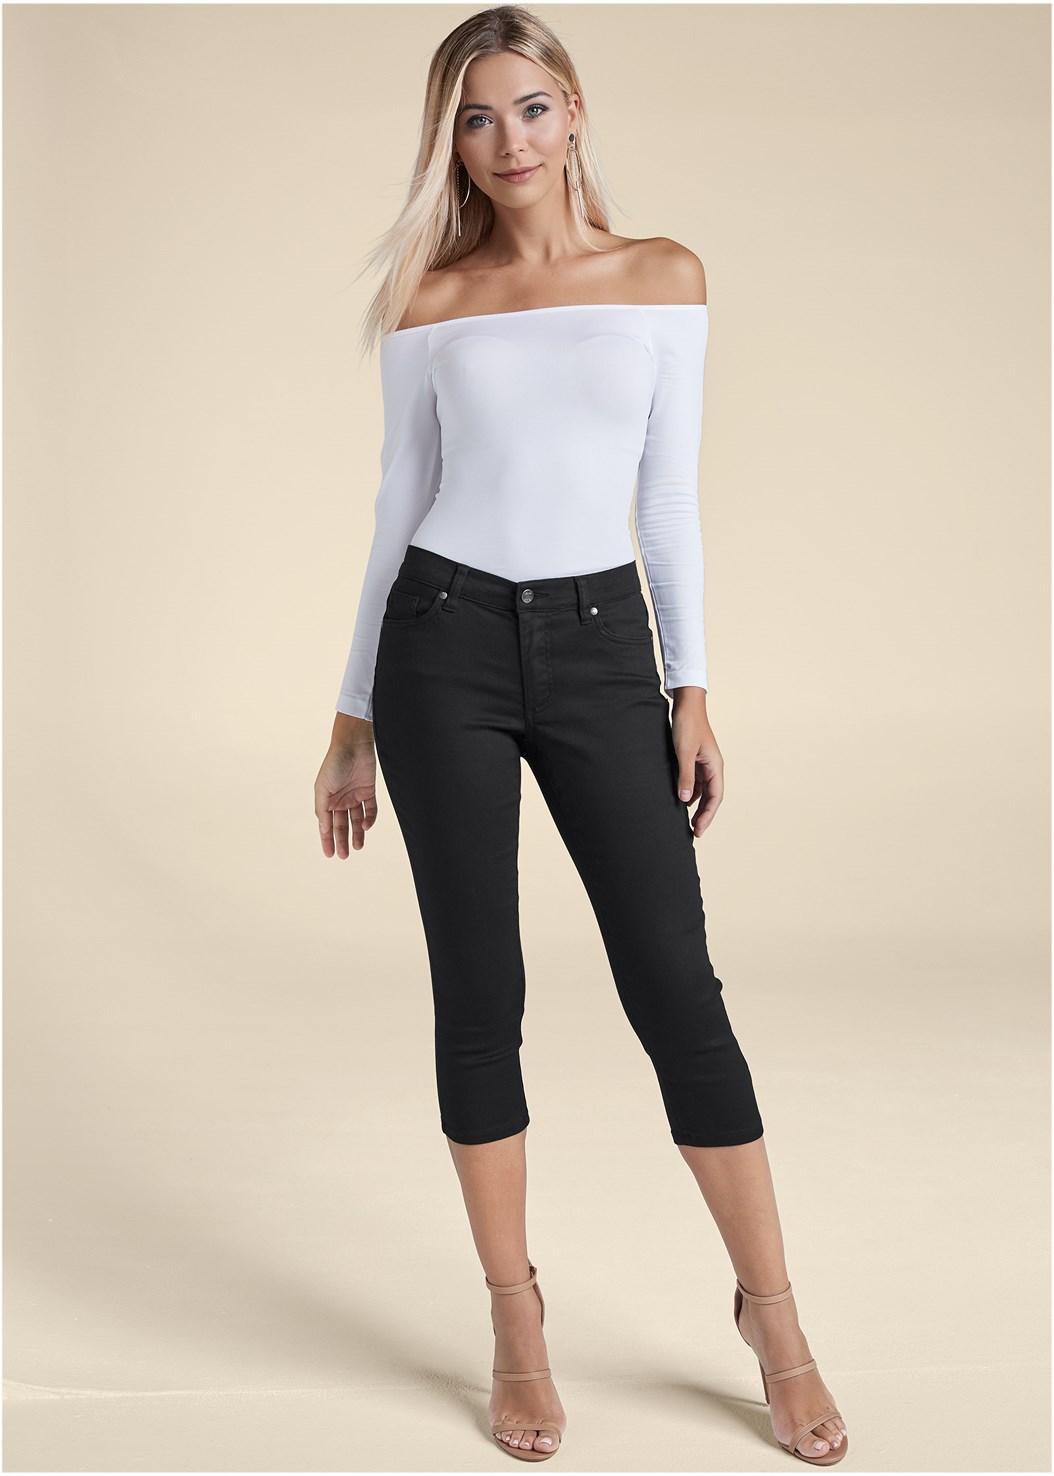 Color Capri Jeans,Off The Shoulder Top,High Heel Strappy Sandals